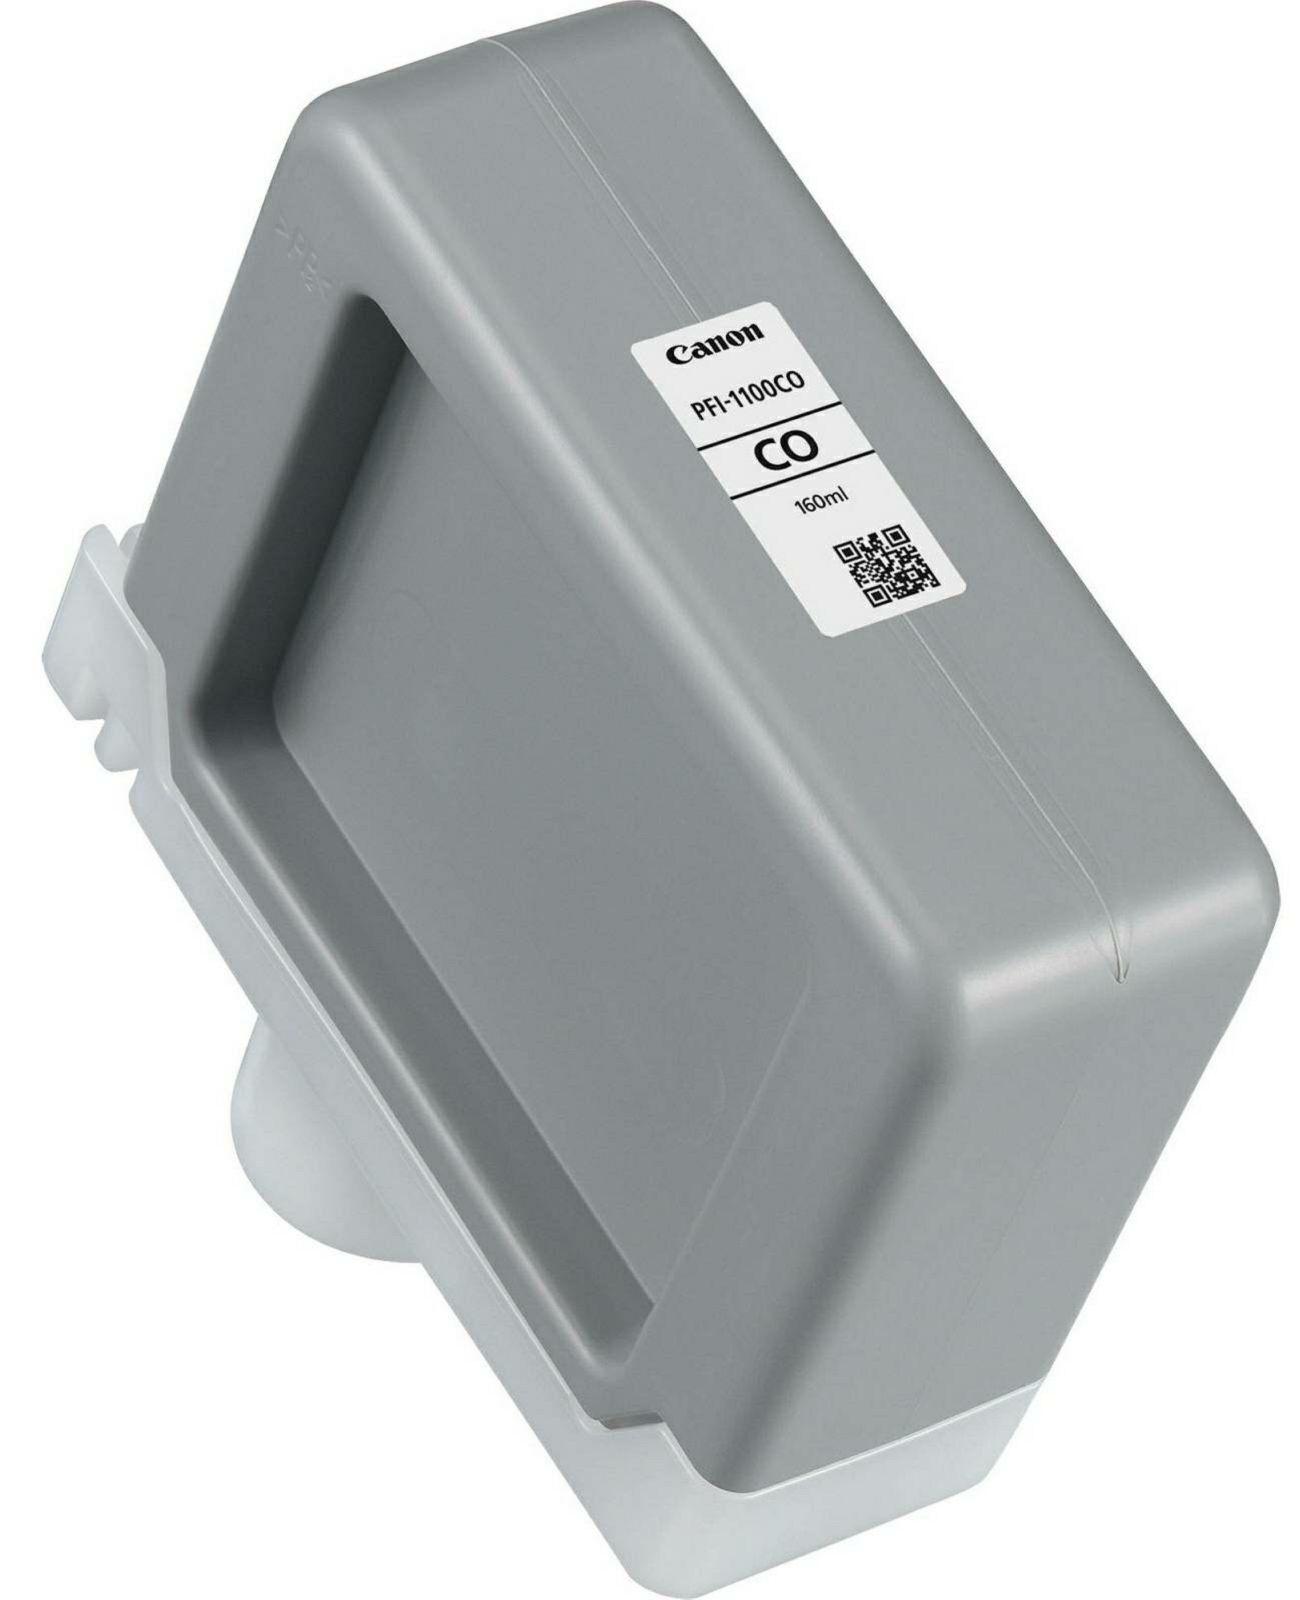 Canon Ink Tank PFI-1100 Chroma Optimizer 160ml PFI1100CHO premaz tinta za ploter imagePROGRAF PRO-2000, PRO-4000, PRO-6000 Large-Format Printers (0860C001AA)